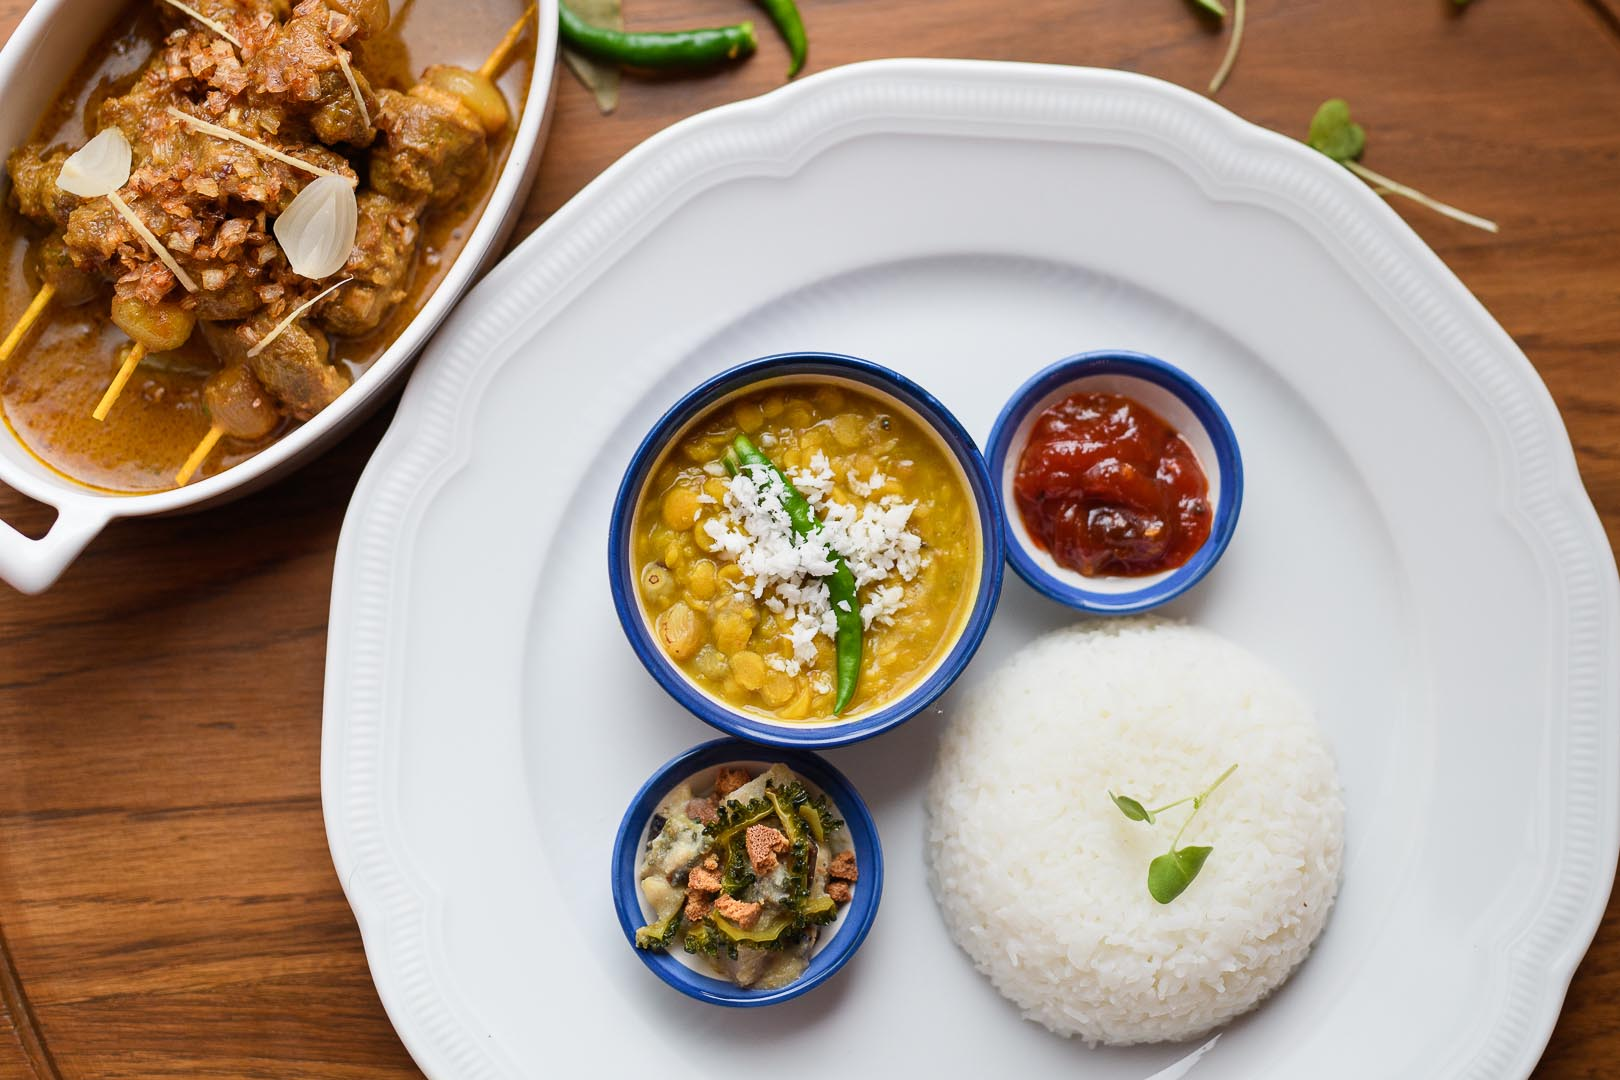 Bengali Cuisine, Featured, Food, French Cuisine, Mustard, Online Exclusive, Restaurant, Bayroute, Featured, Food, Koko, Miss T, Mustard, Online Exclusive, Origami, Restaurants, Verve Gourmand, Wine & Dine